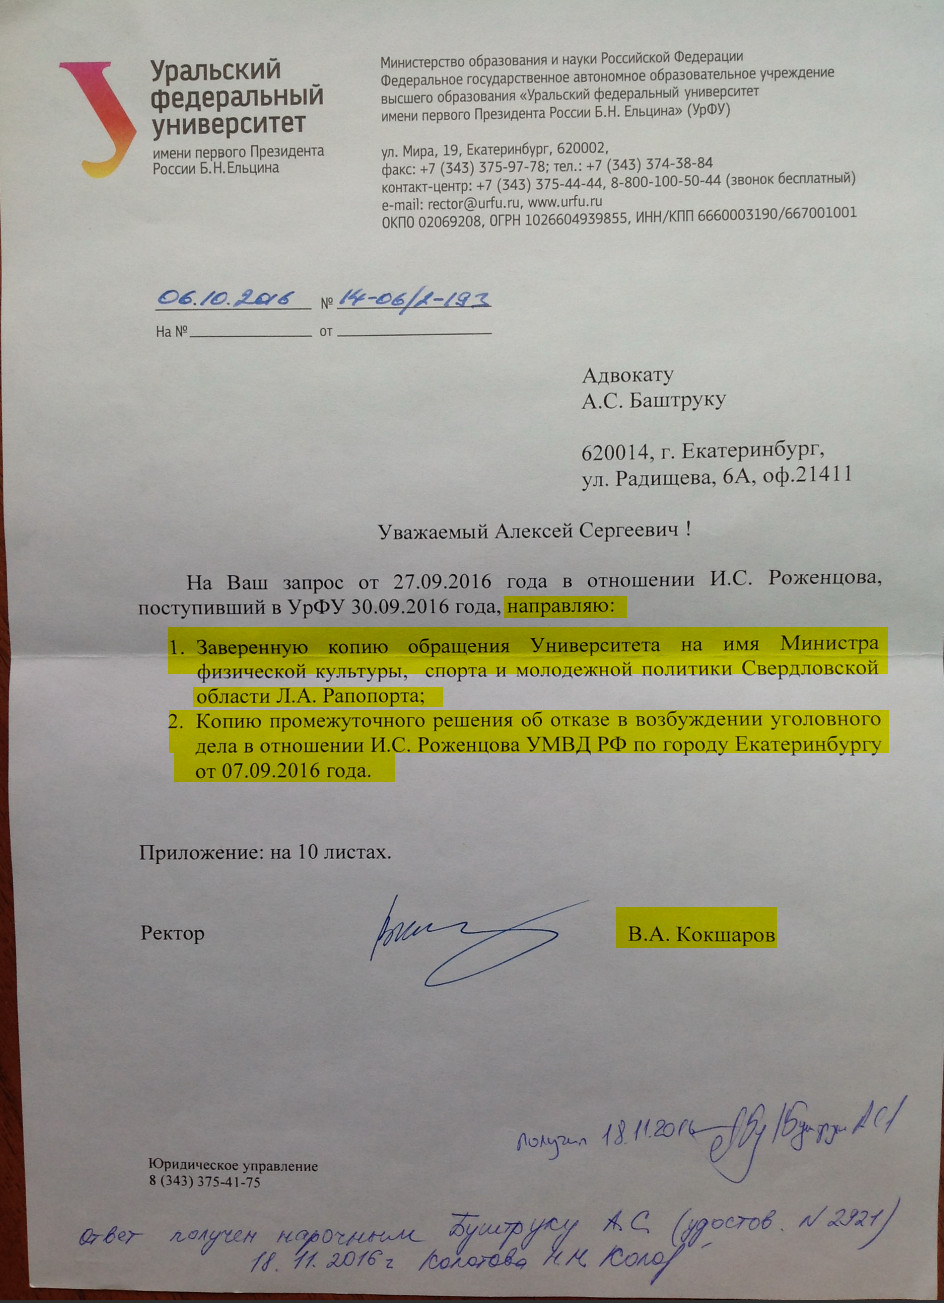 УрФУ Роженцов Буштрук Маматов Финмониторинг Интерпол 1